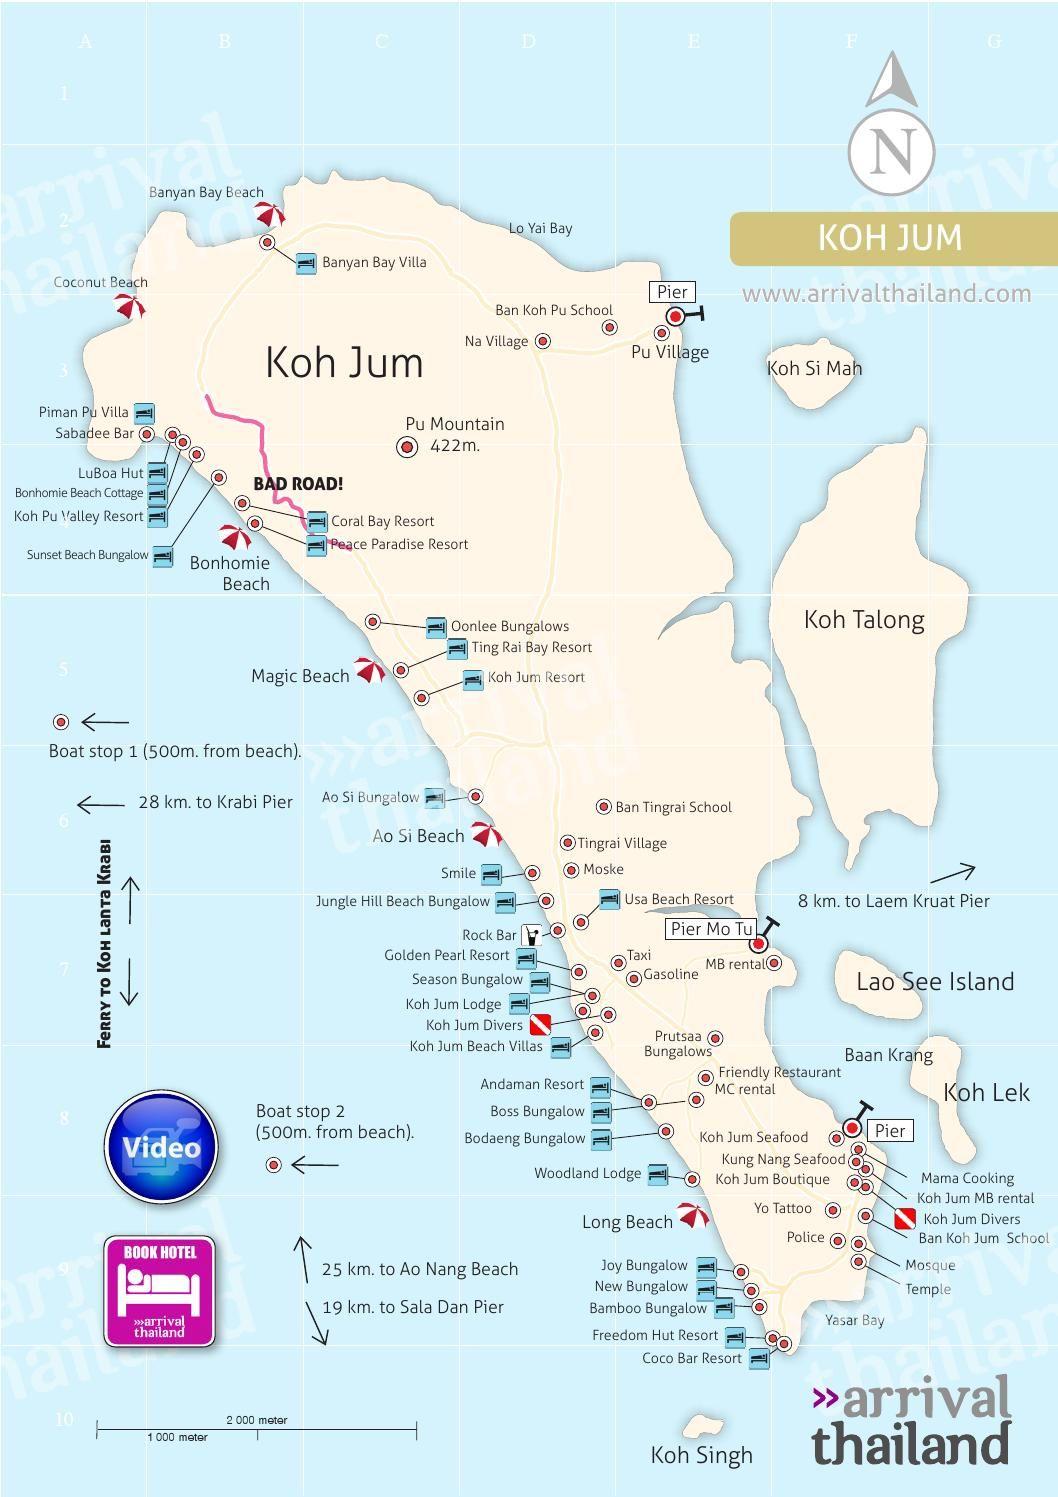 Arrival Thailand Koh Jum Map